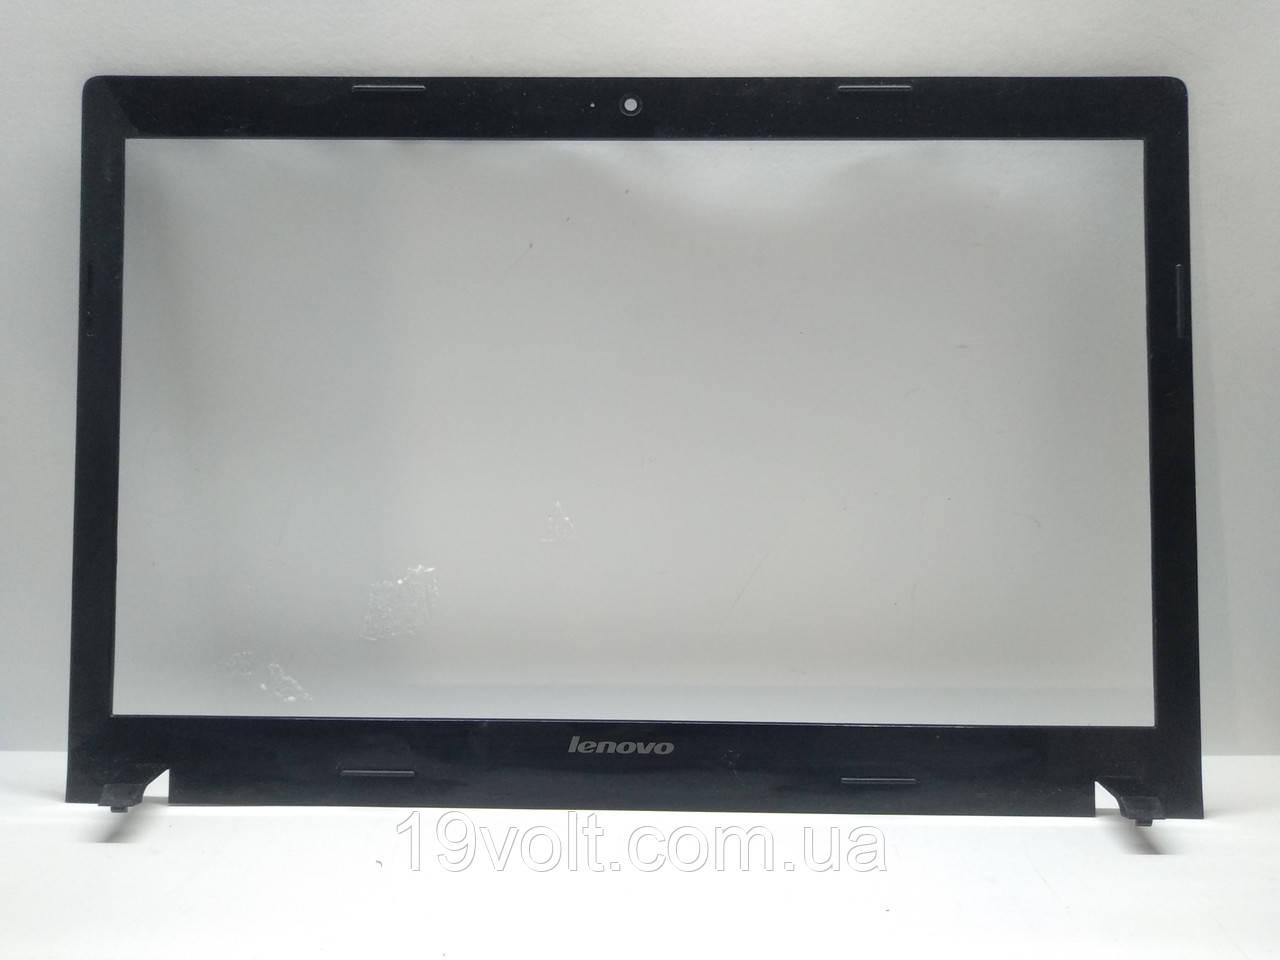 Рамка Lenovo G500, 505, 510 б.у. Оригінал